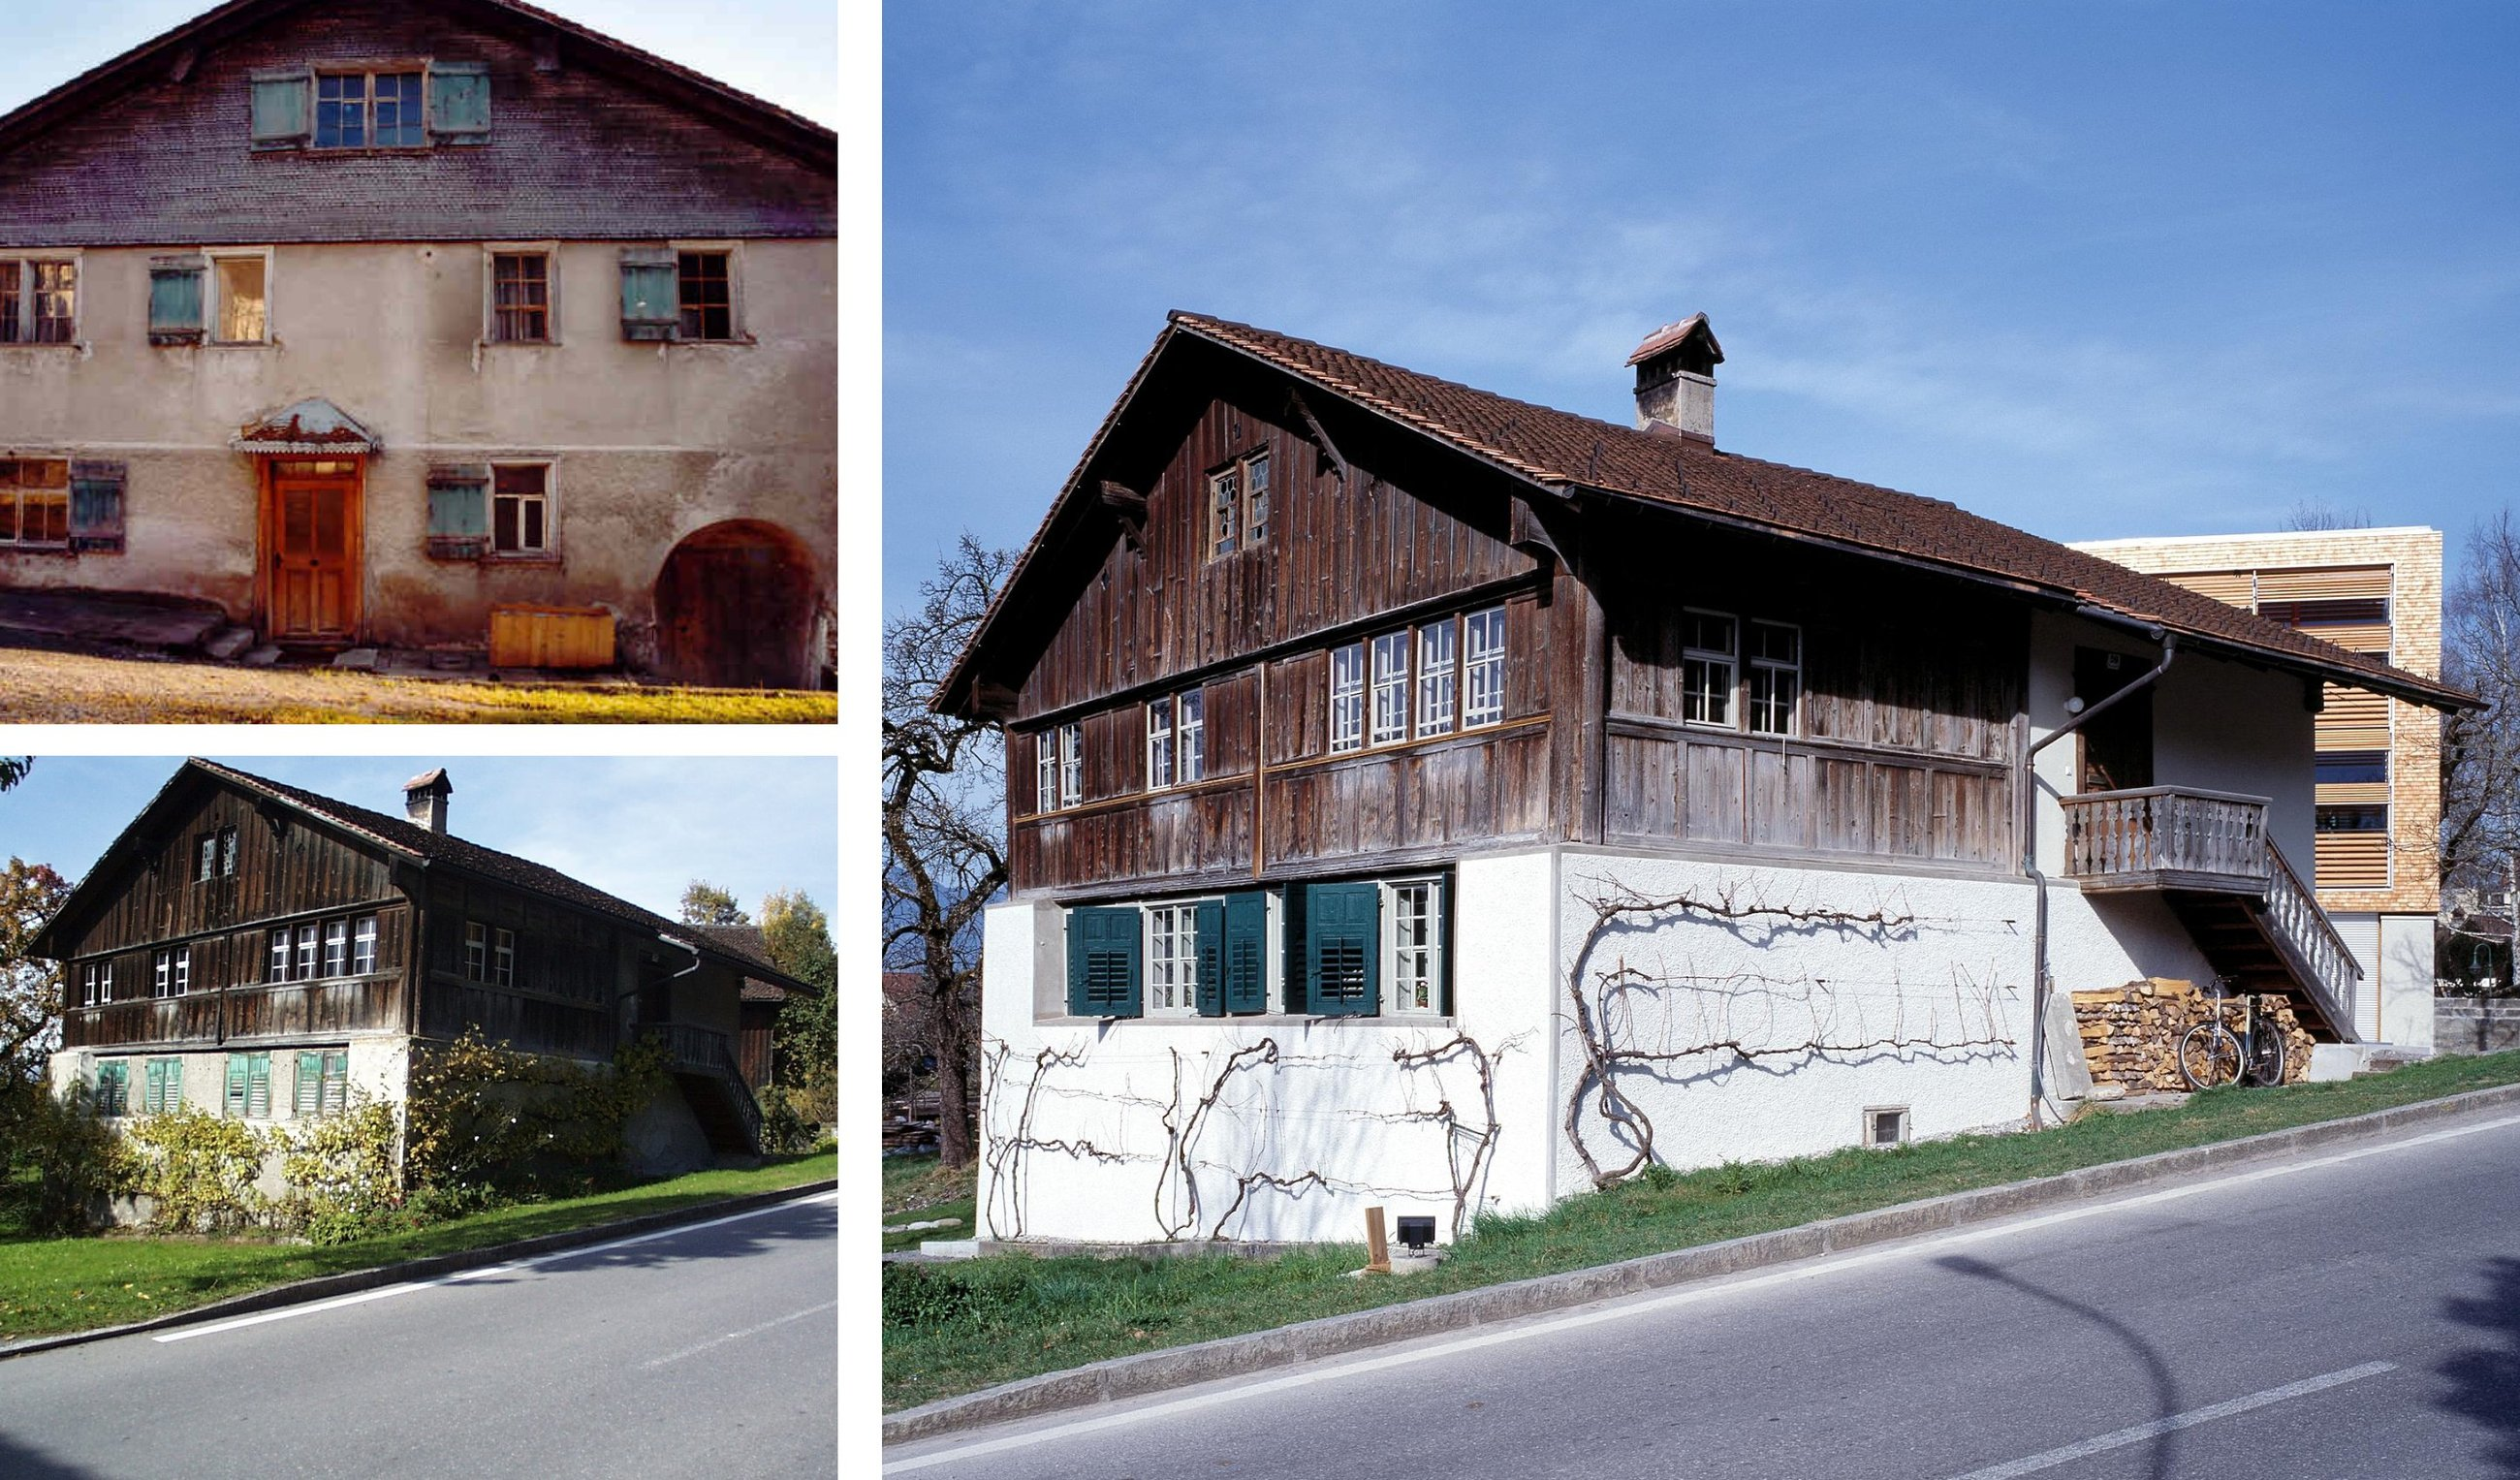 Vinothek Stöger, Röthis, drexel architekten